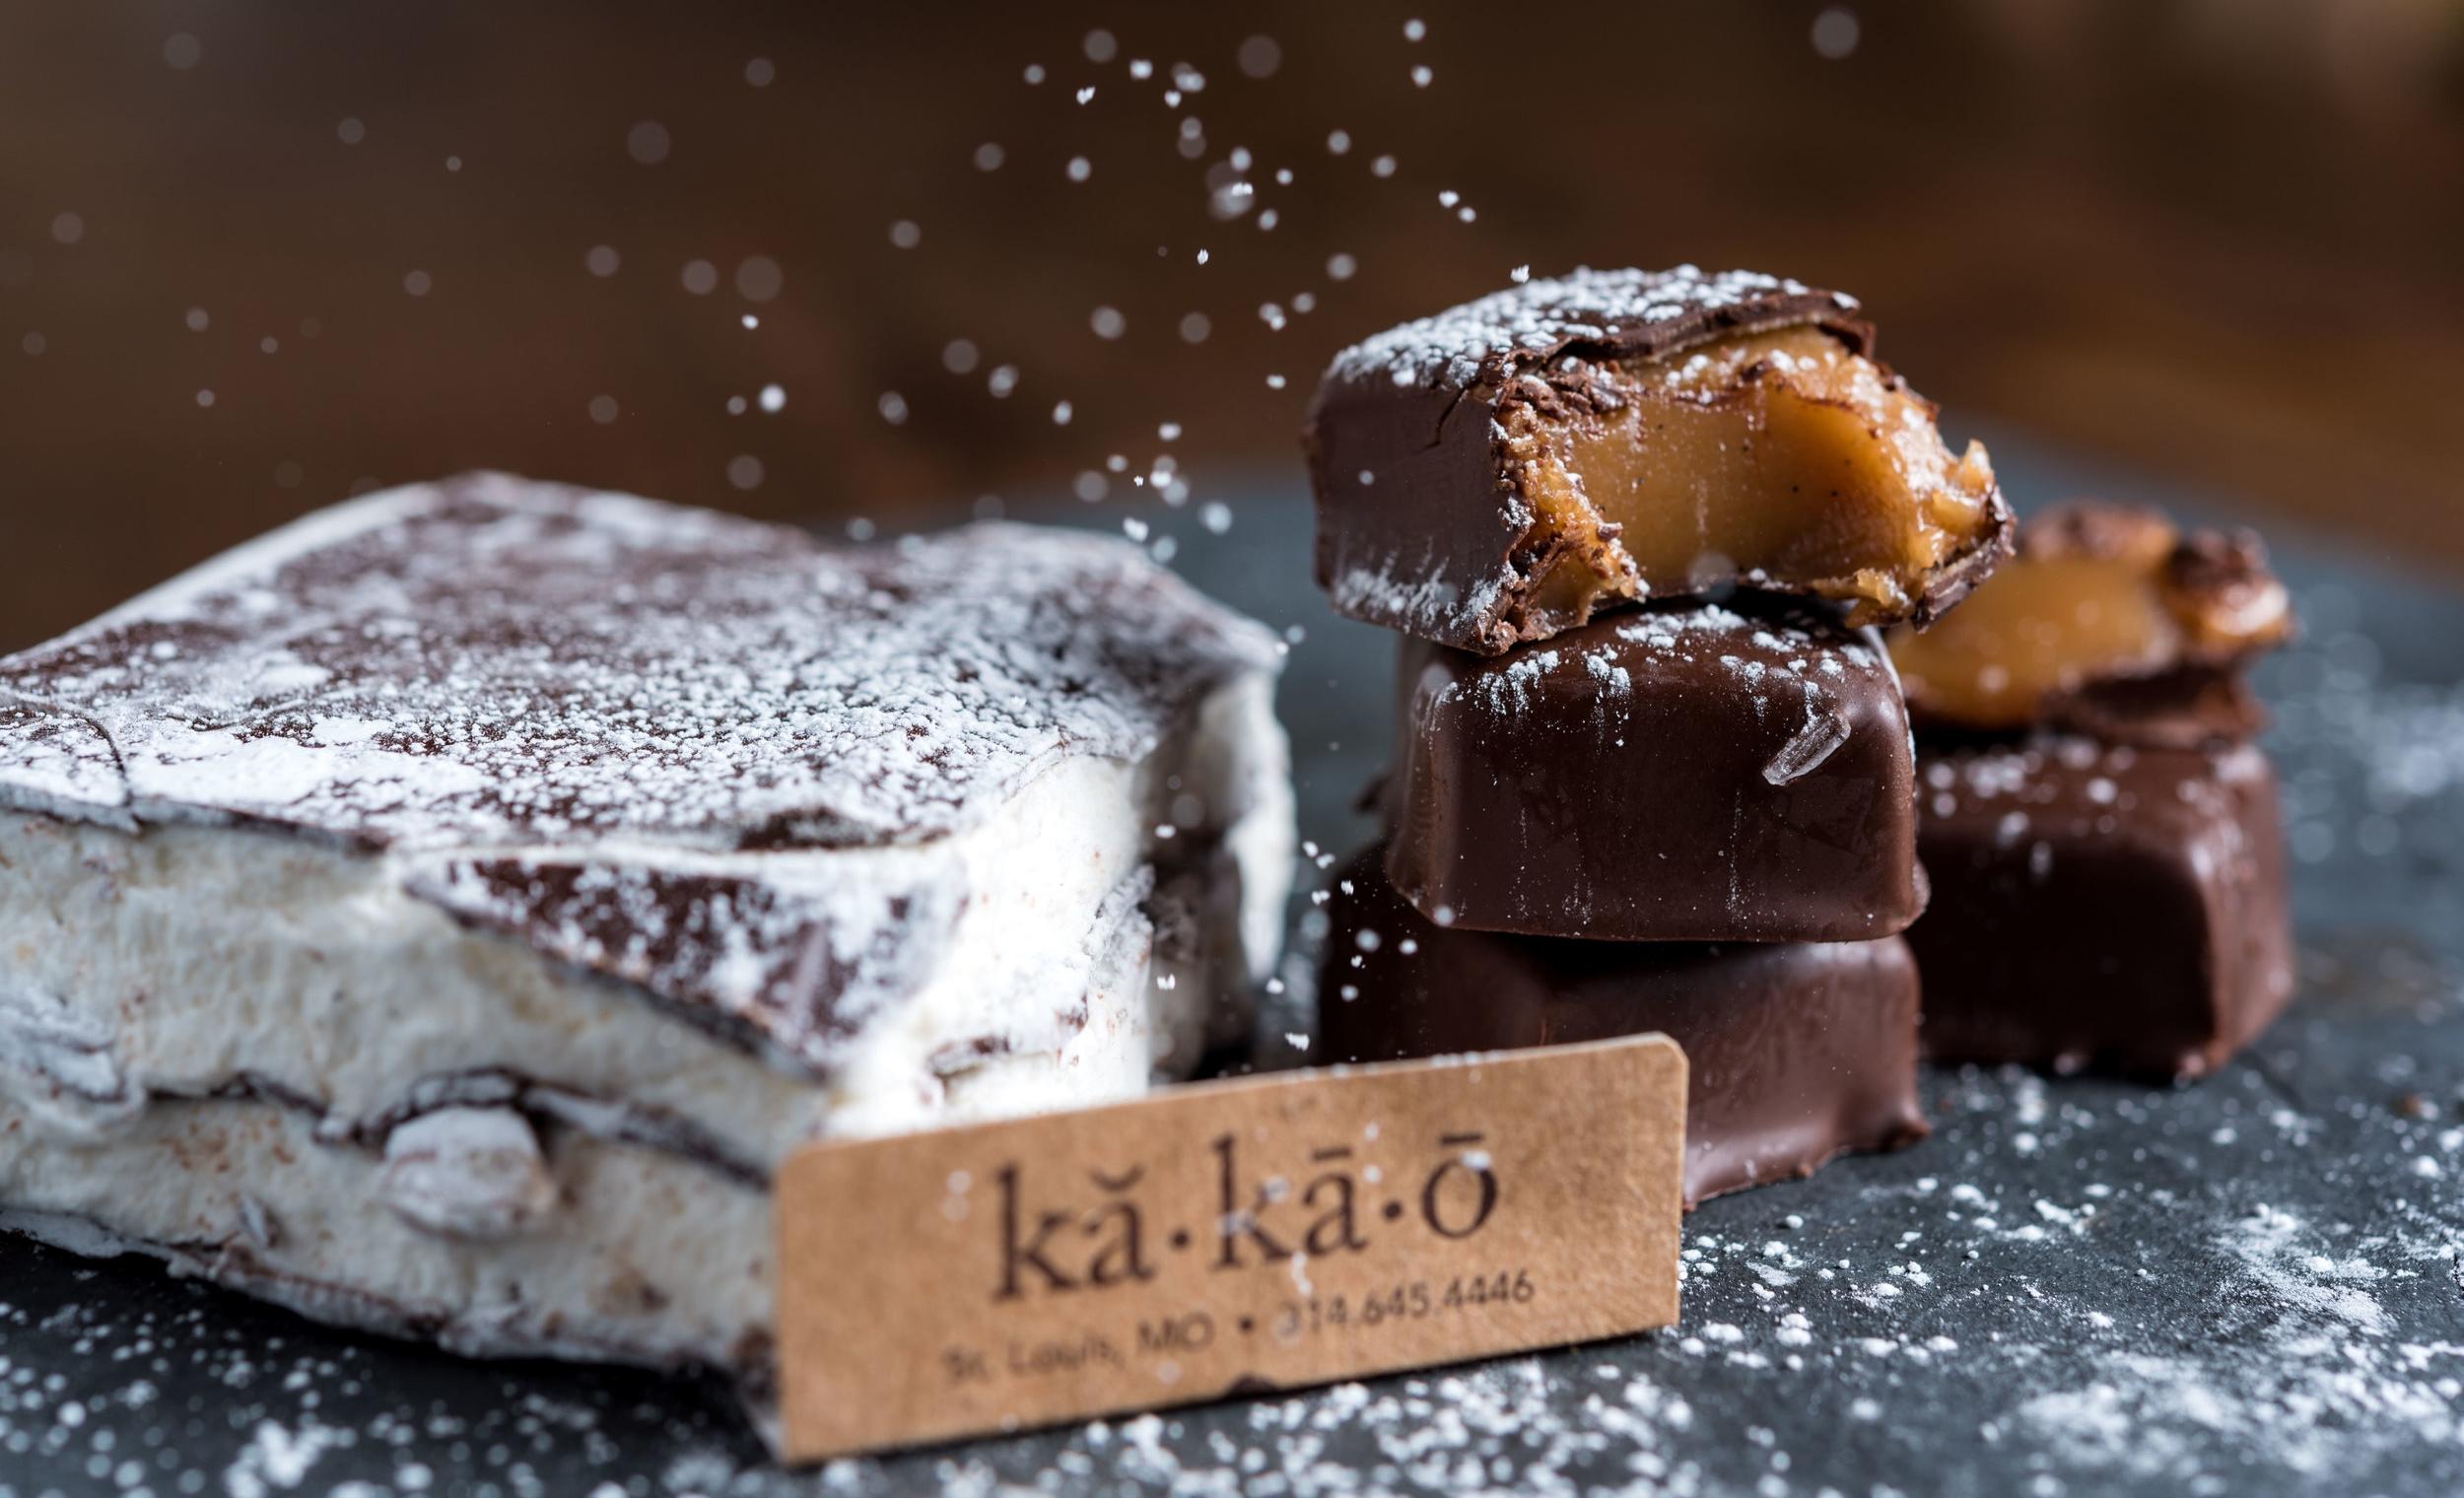 Kakao Chocolate, St. Louis MO